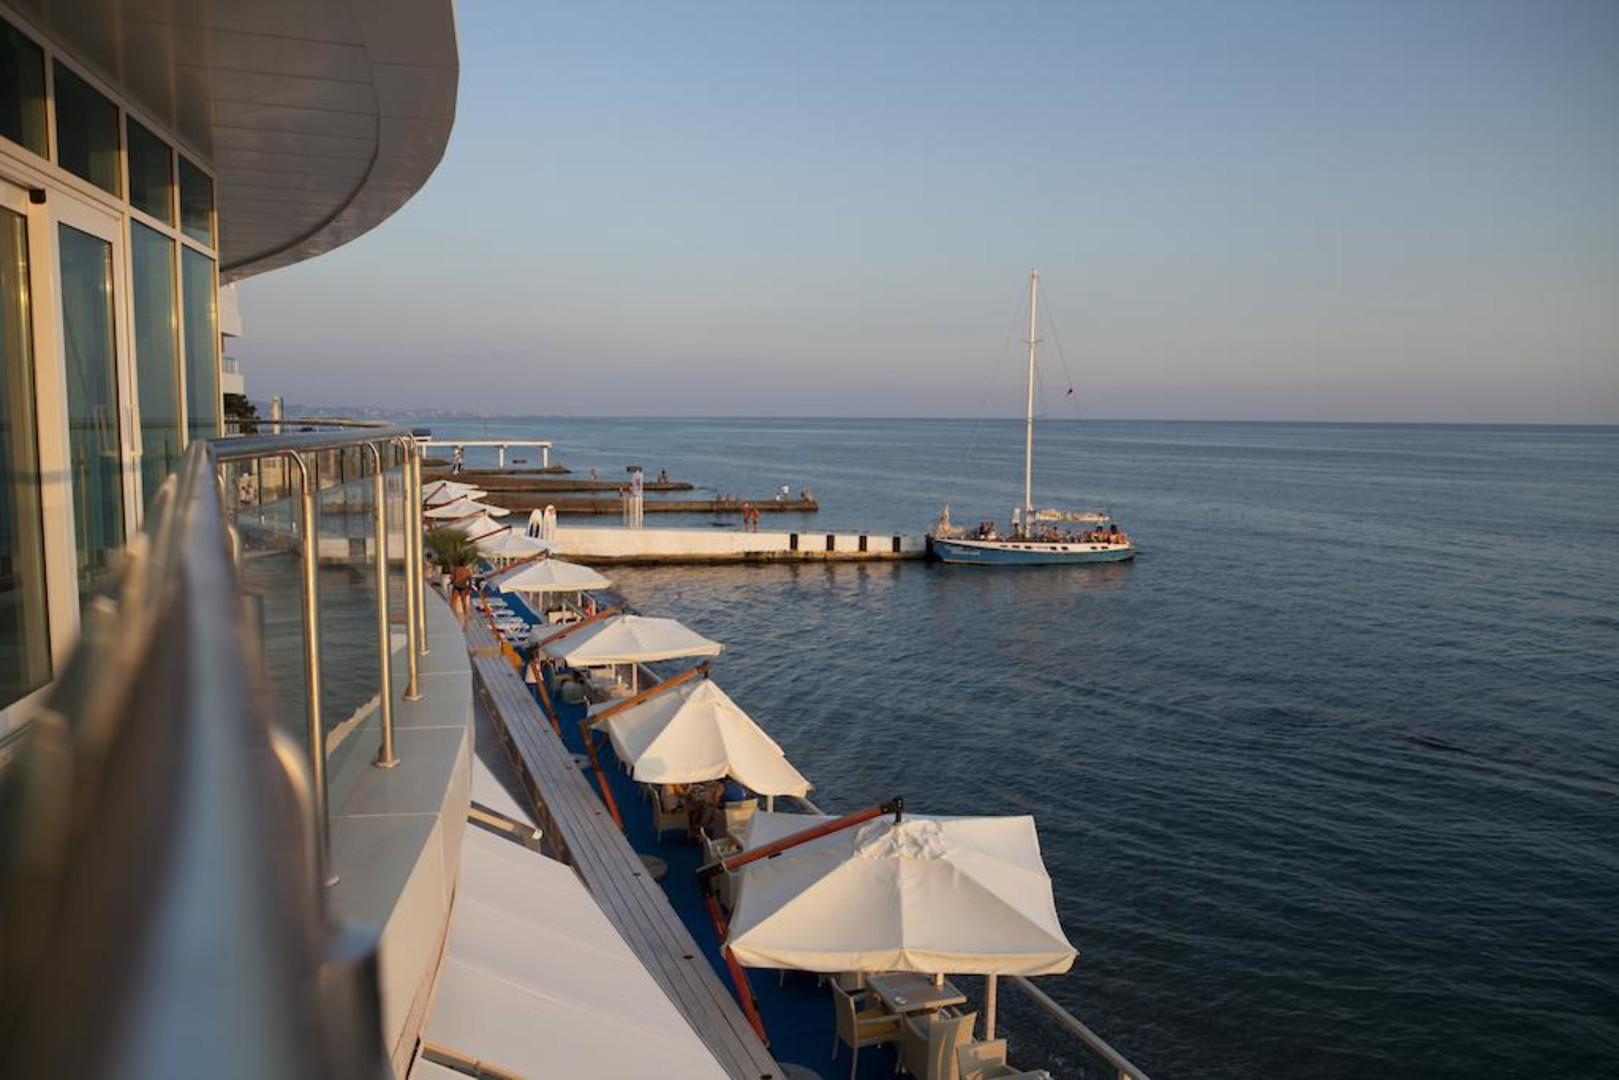 Sanremo20.jpg